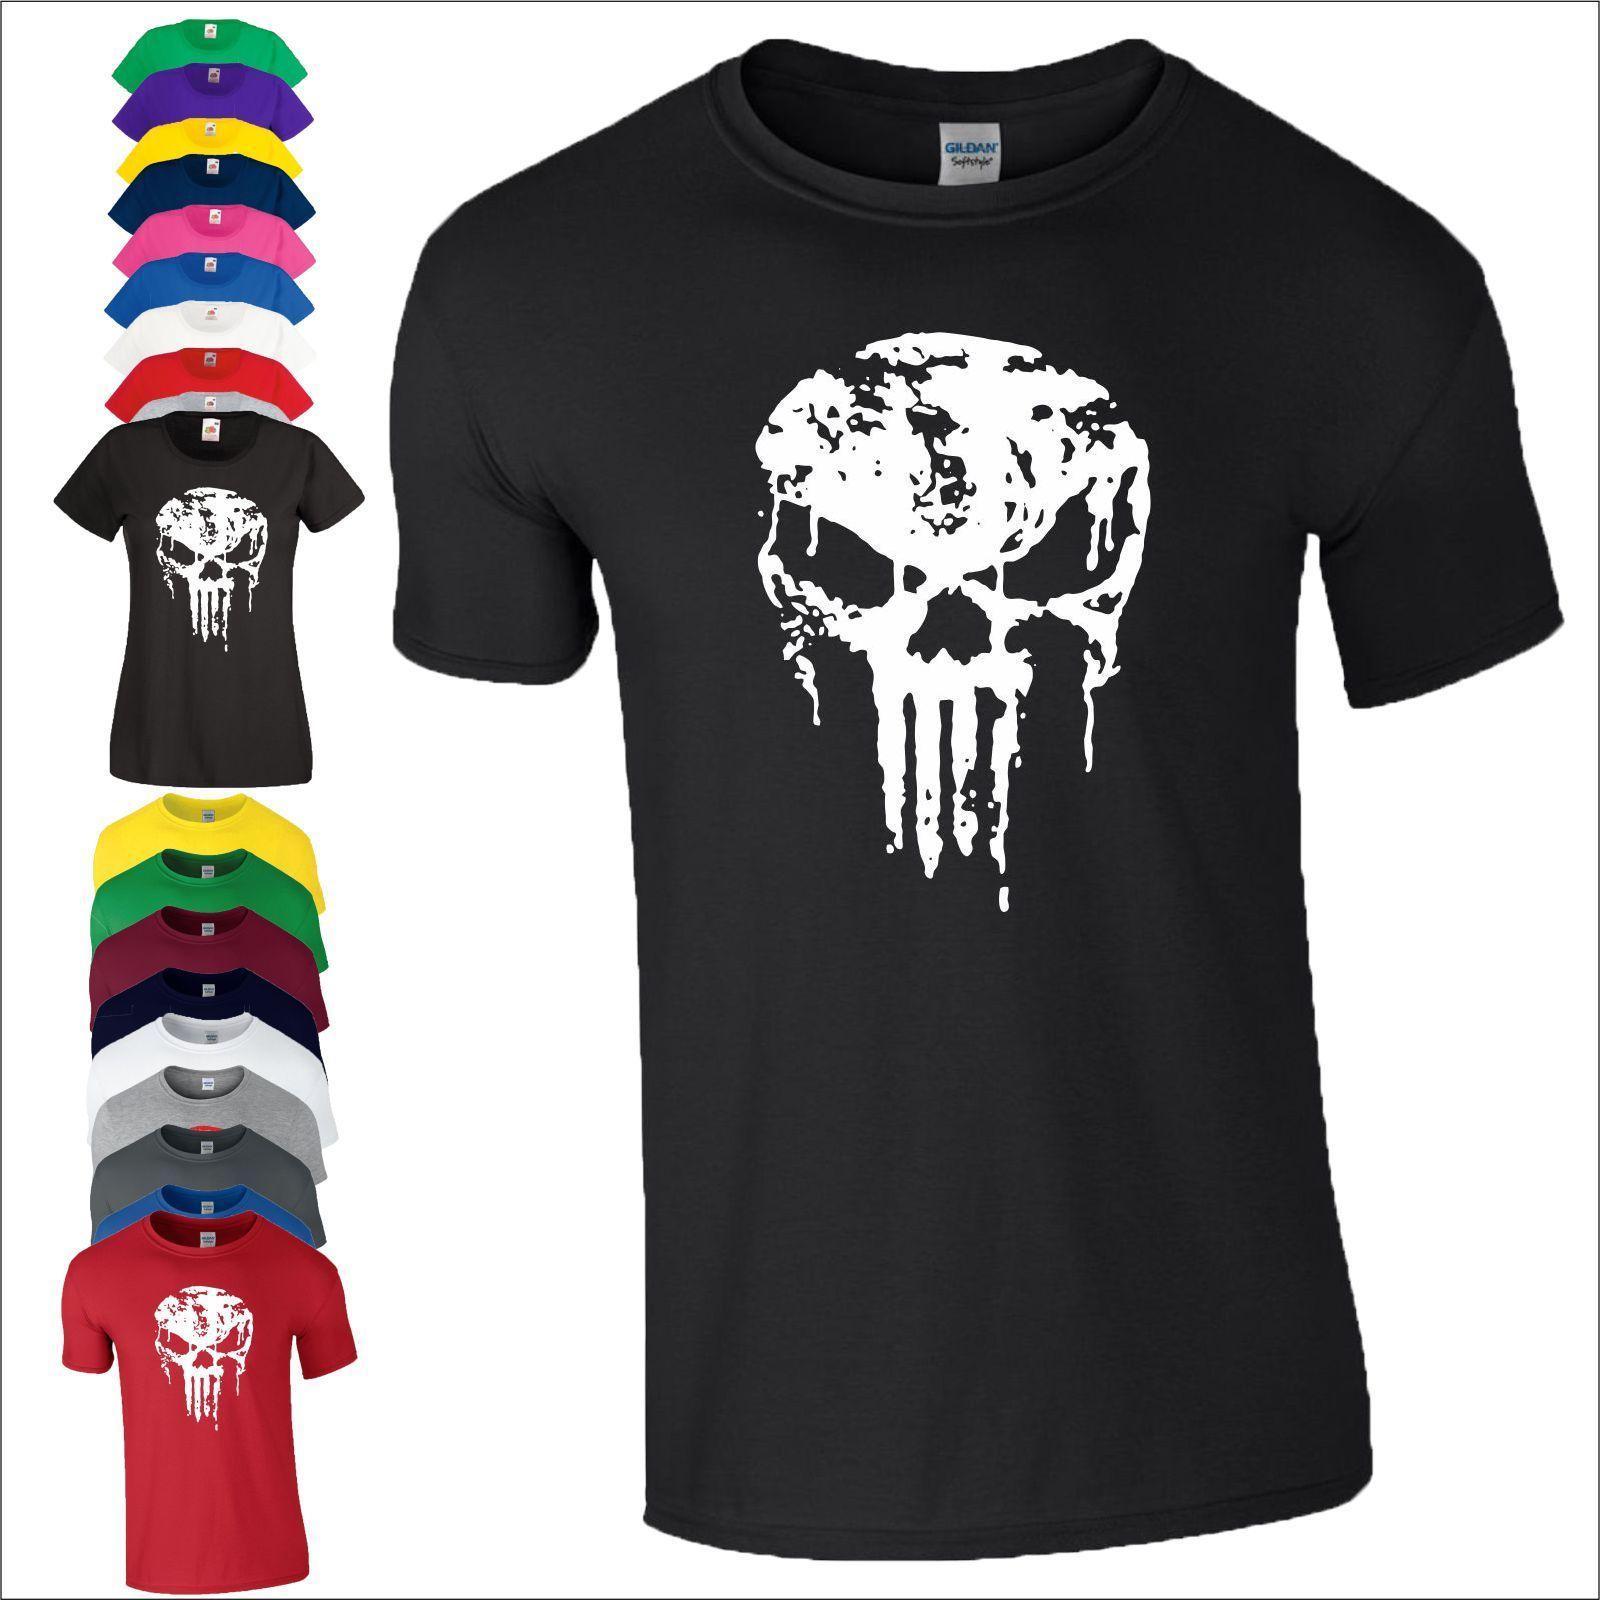 Punisher Skull T Shirt Crossfit Gym Fitness Mma Fight Marvel Gift ...